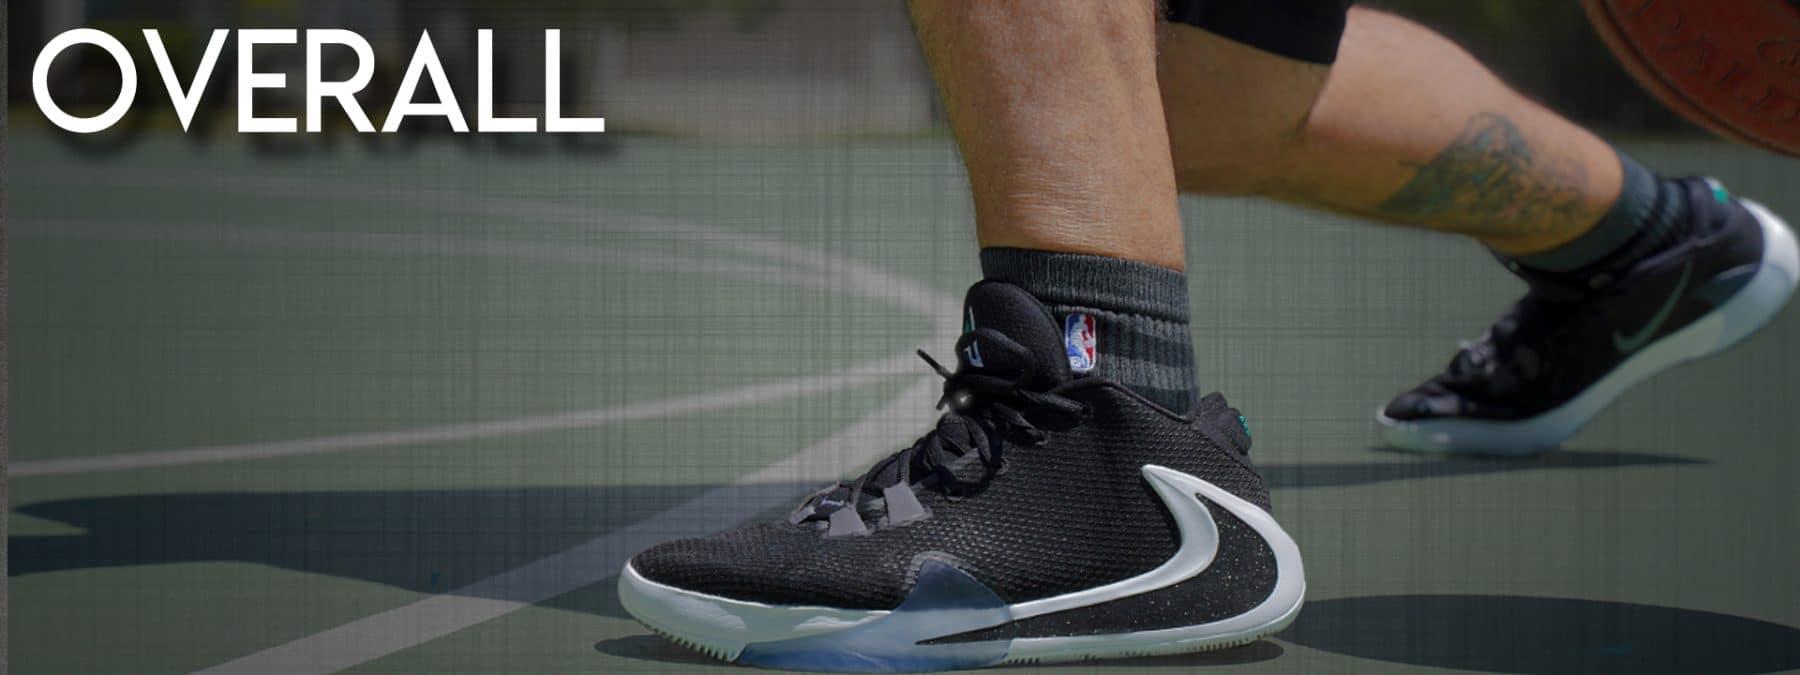 Nike Zoom Freak 1 Performance Review